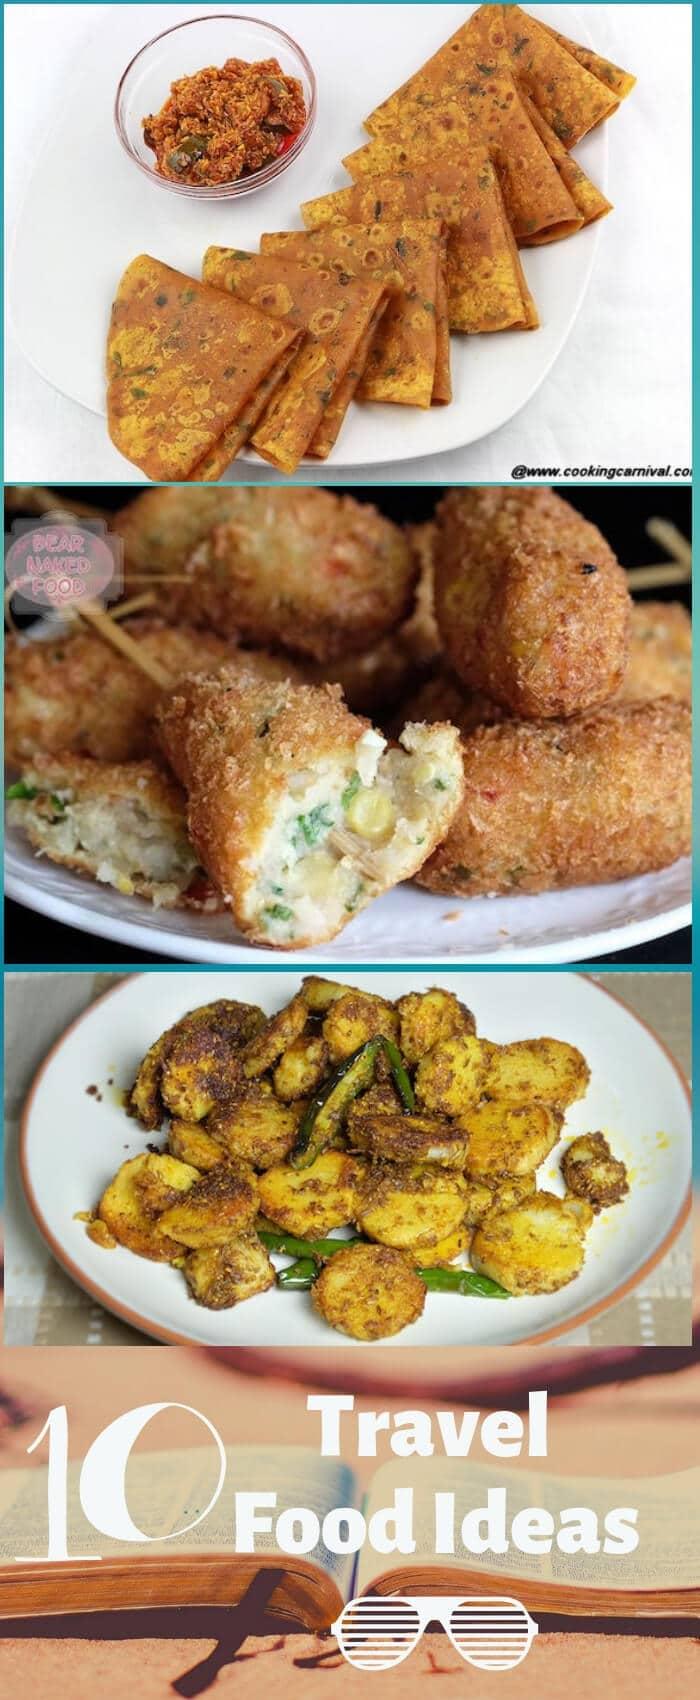 travel foods pinterest